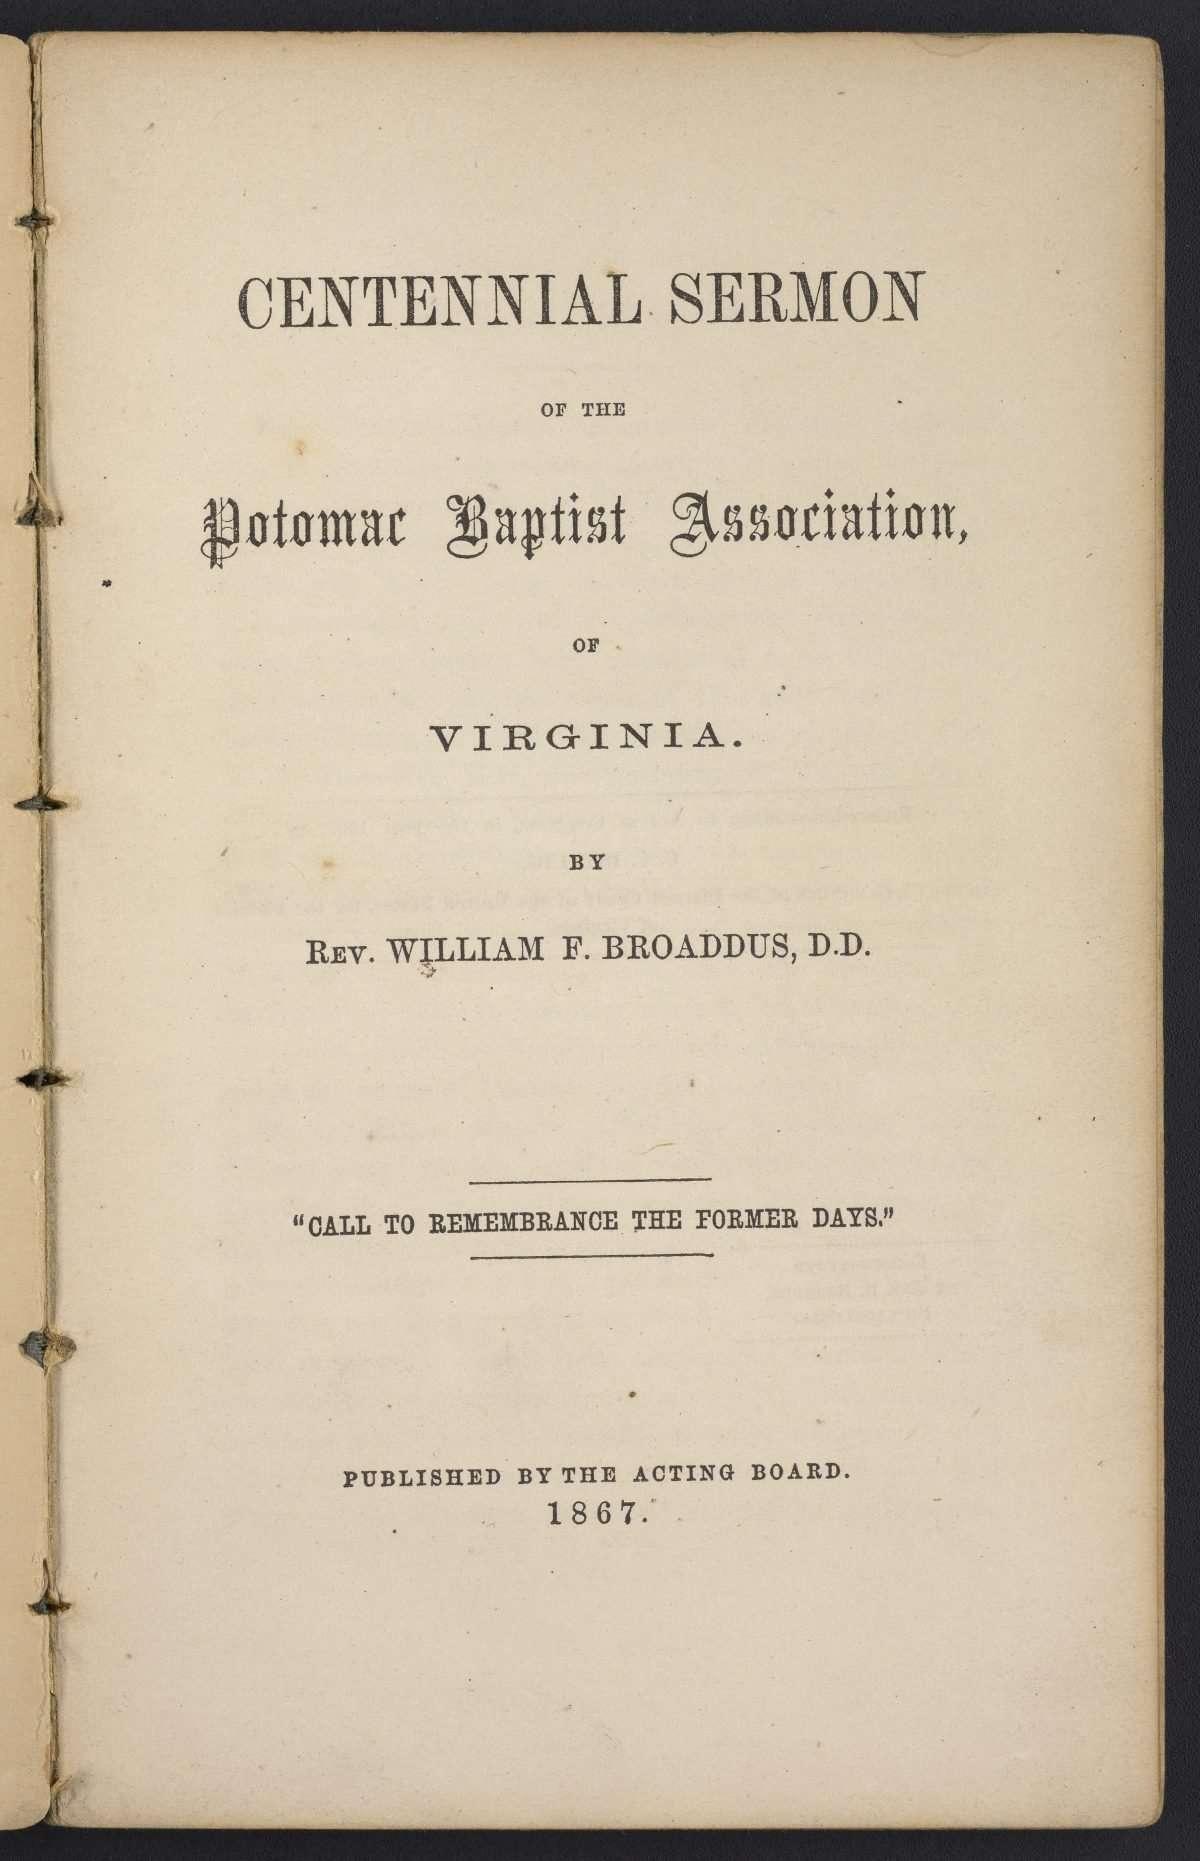 Centennial Sermon of the Potomac Baptist Association